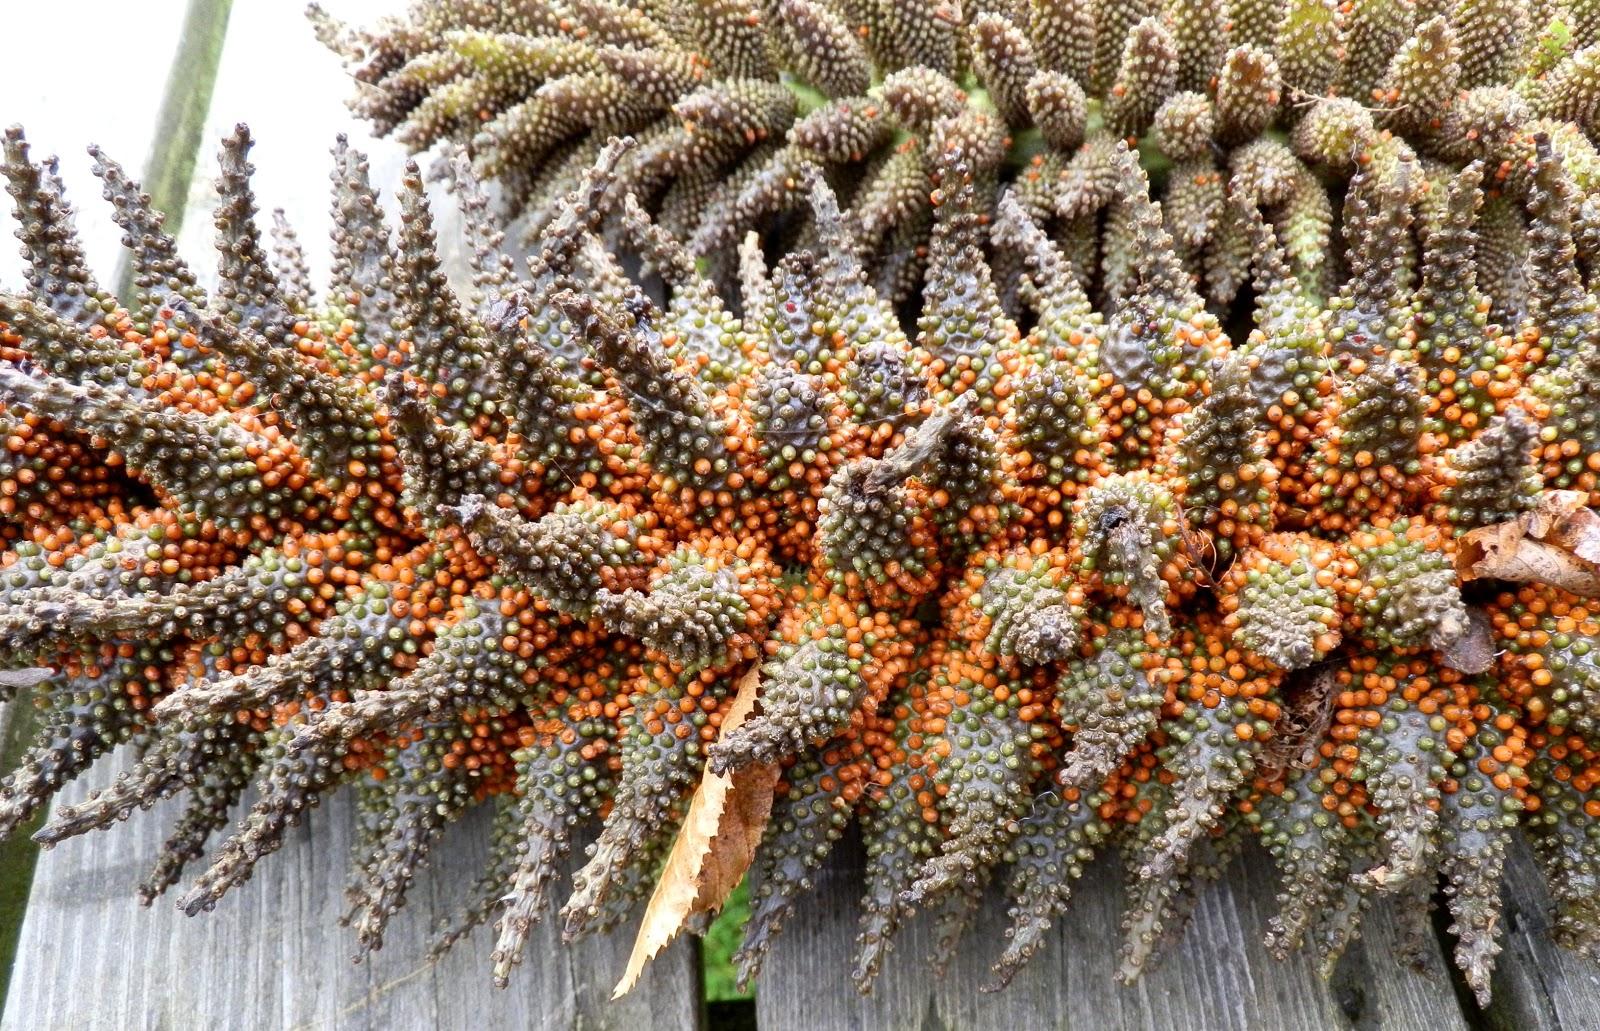 Giant Rhubarb - Gunnera tinctoria seeds 3